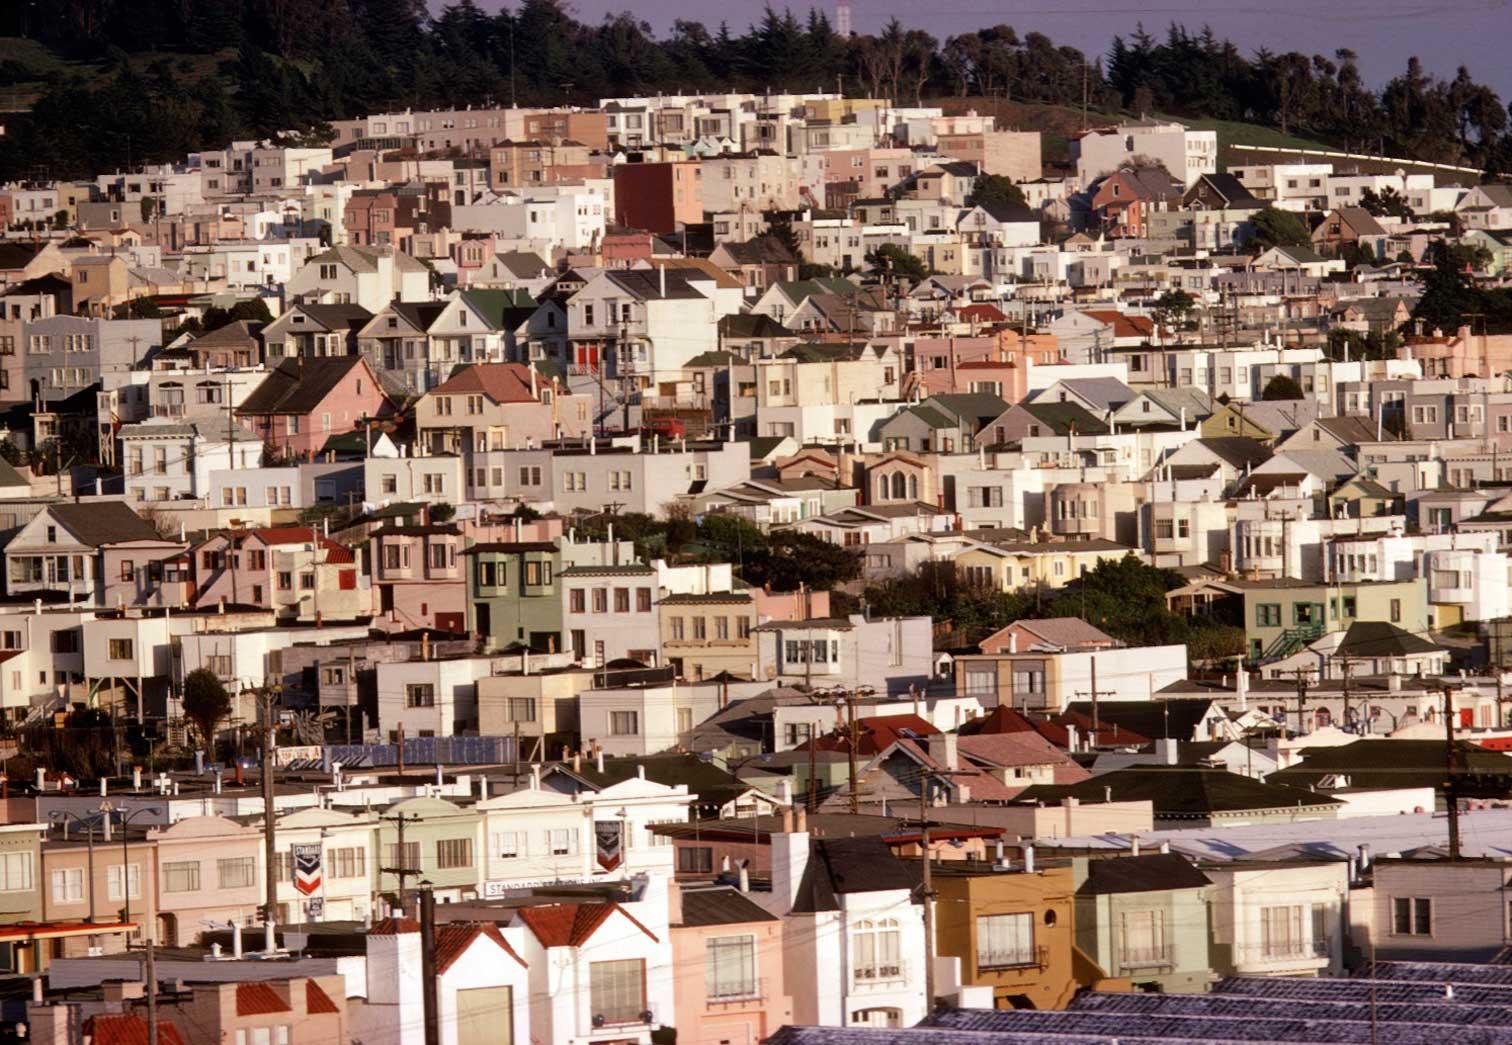 San Francisco, c. 1970